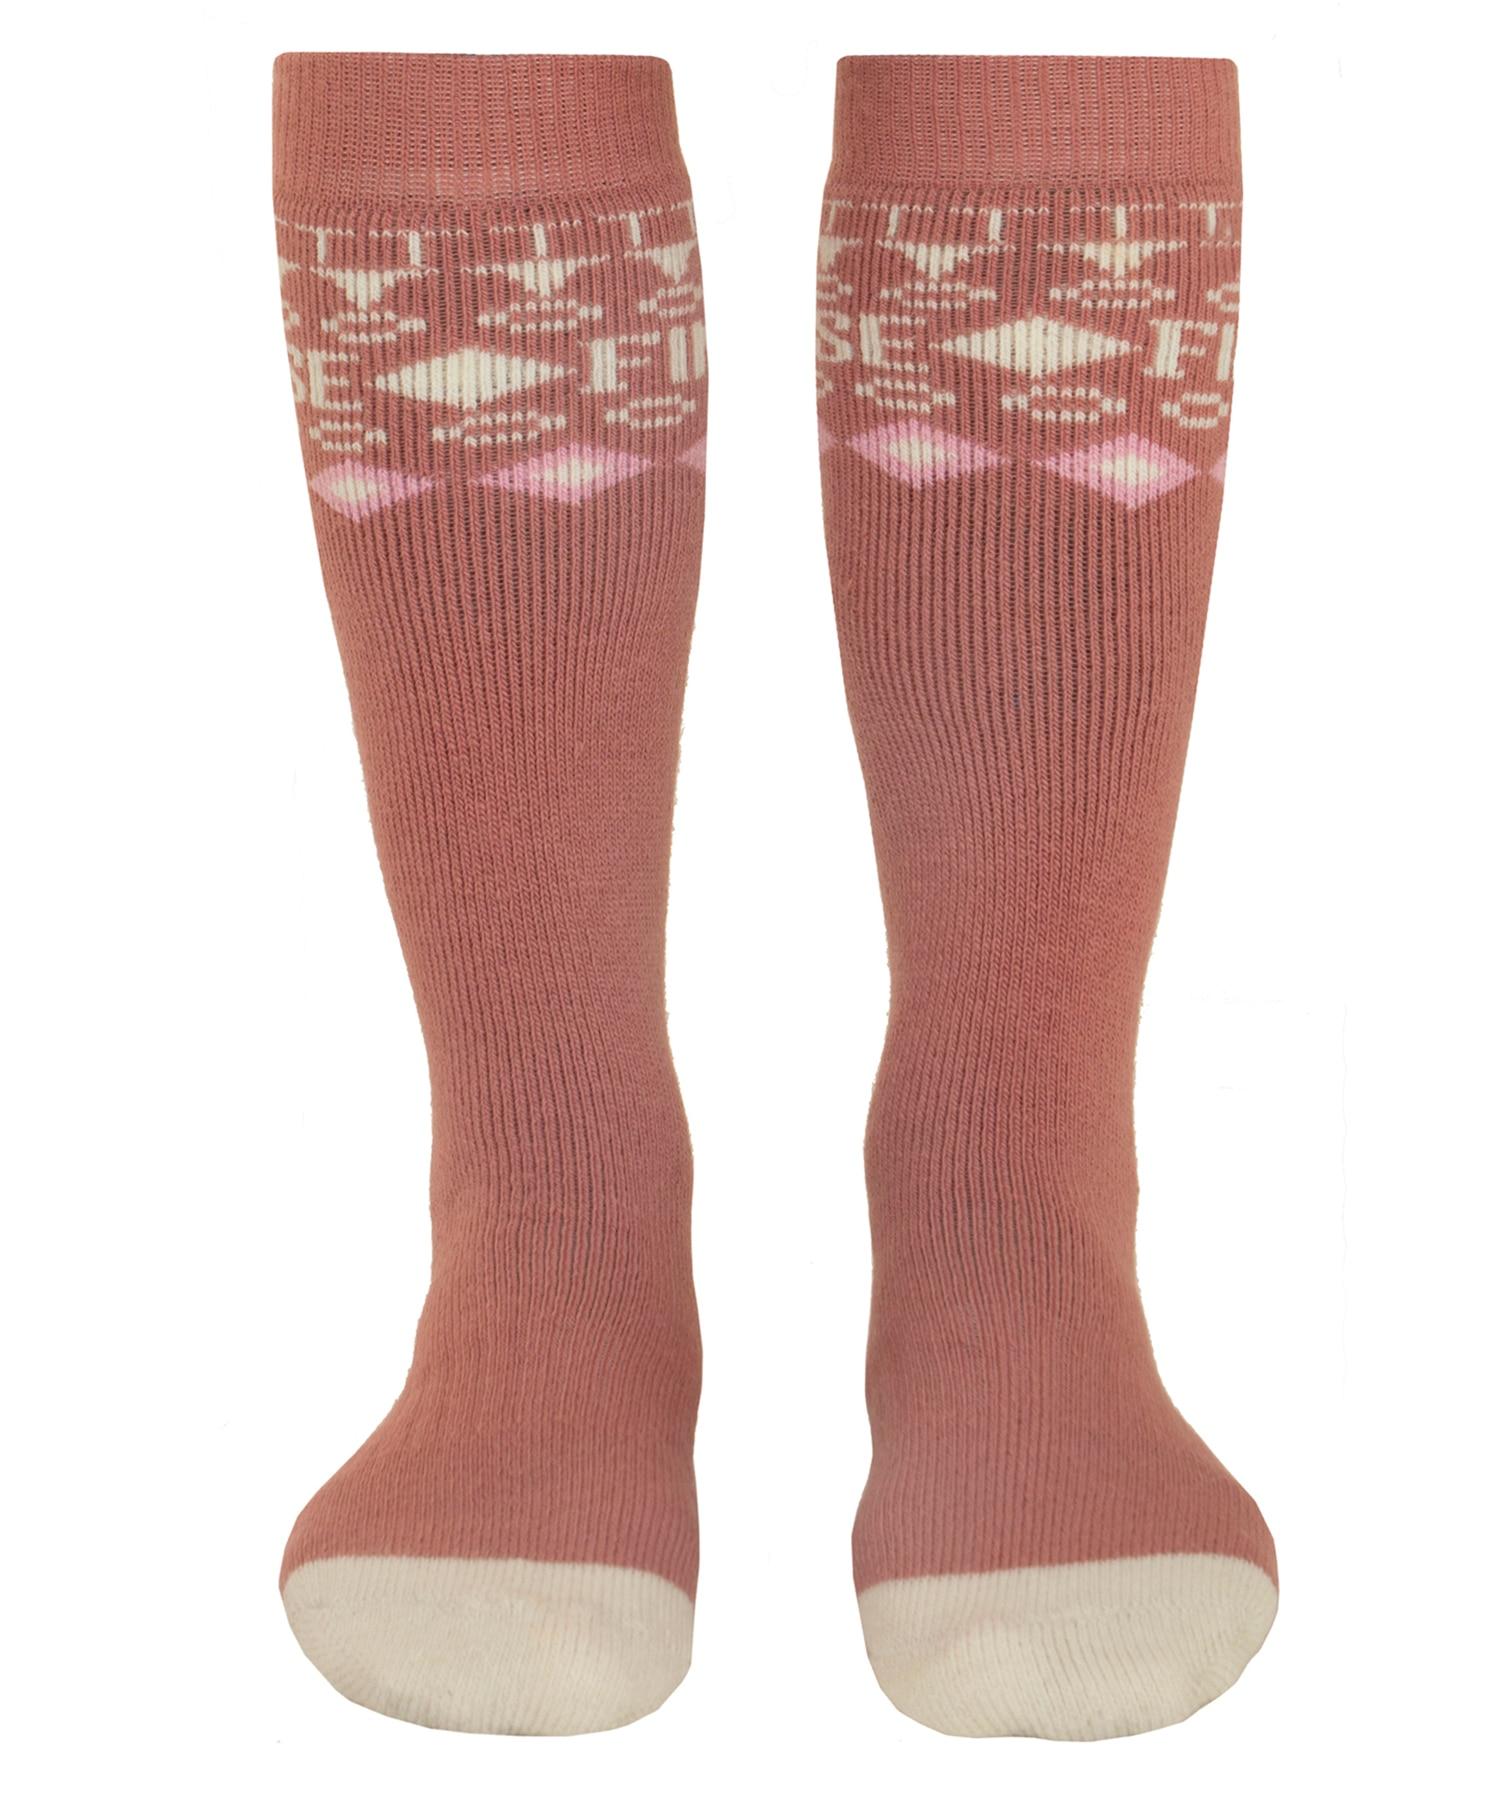 Twentyfour Finse sokk